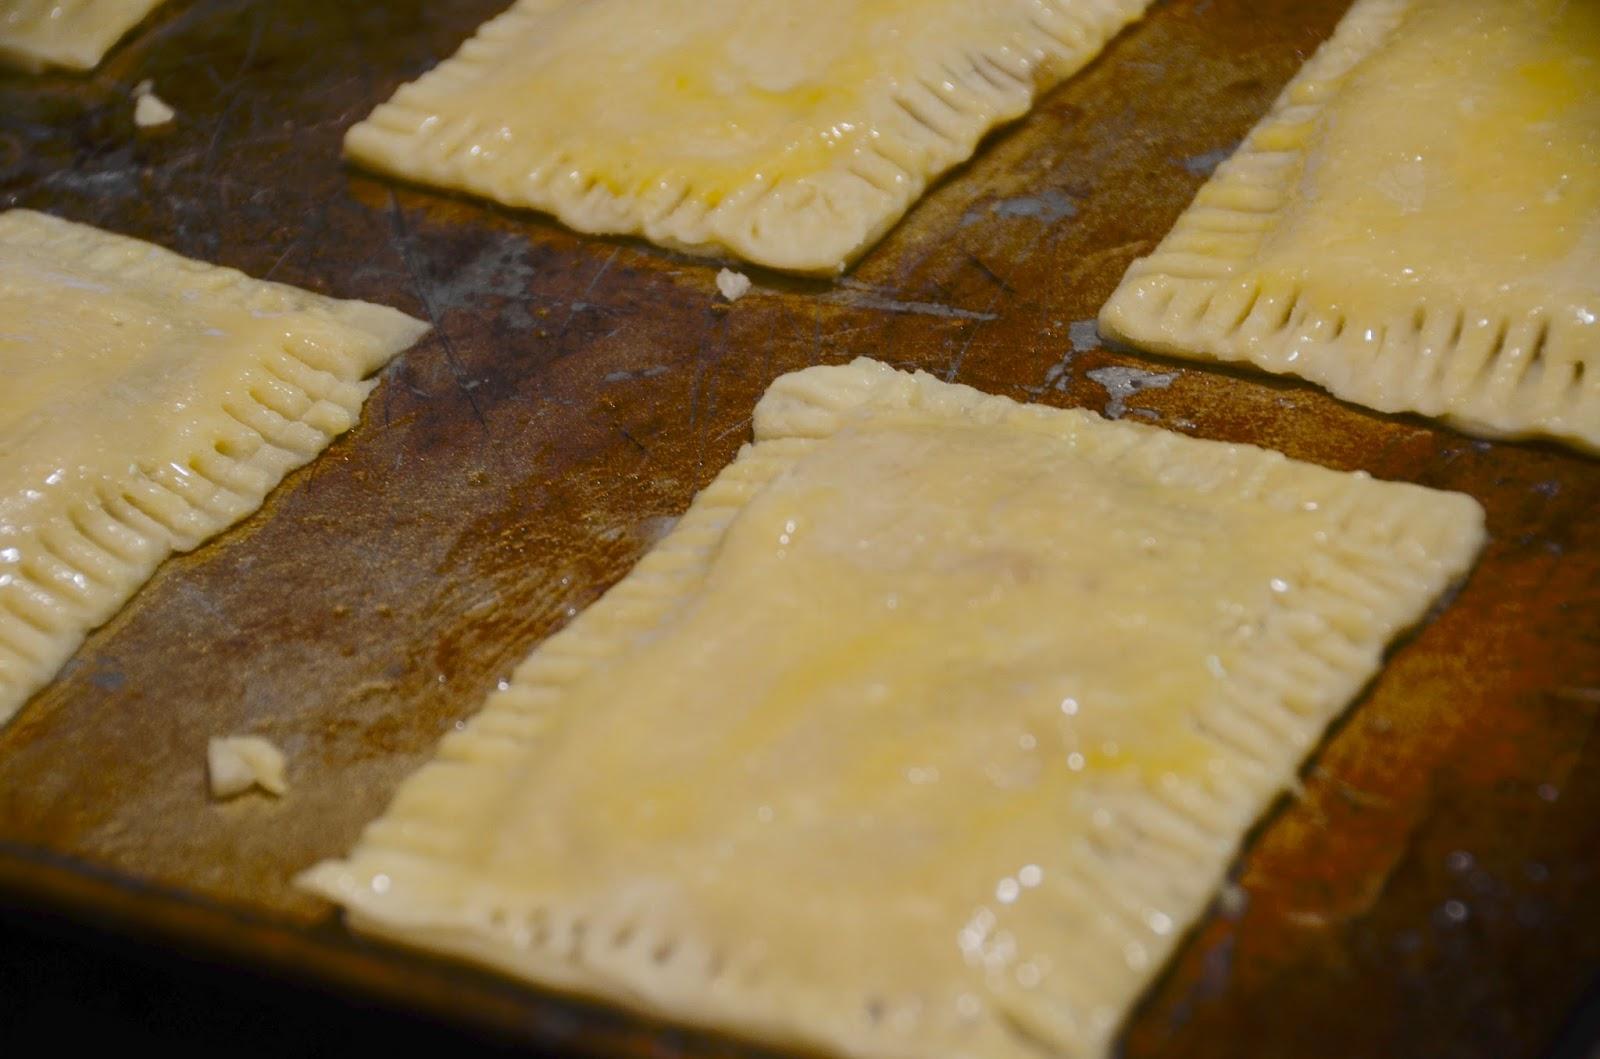 SRC Reveal: Homemade Brown Sugar Cinnamon Pop Tarts